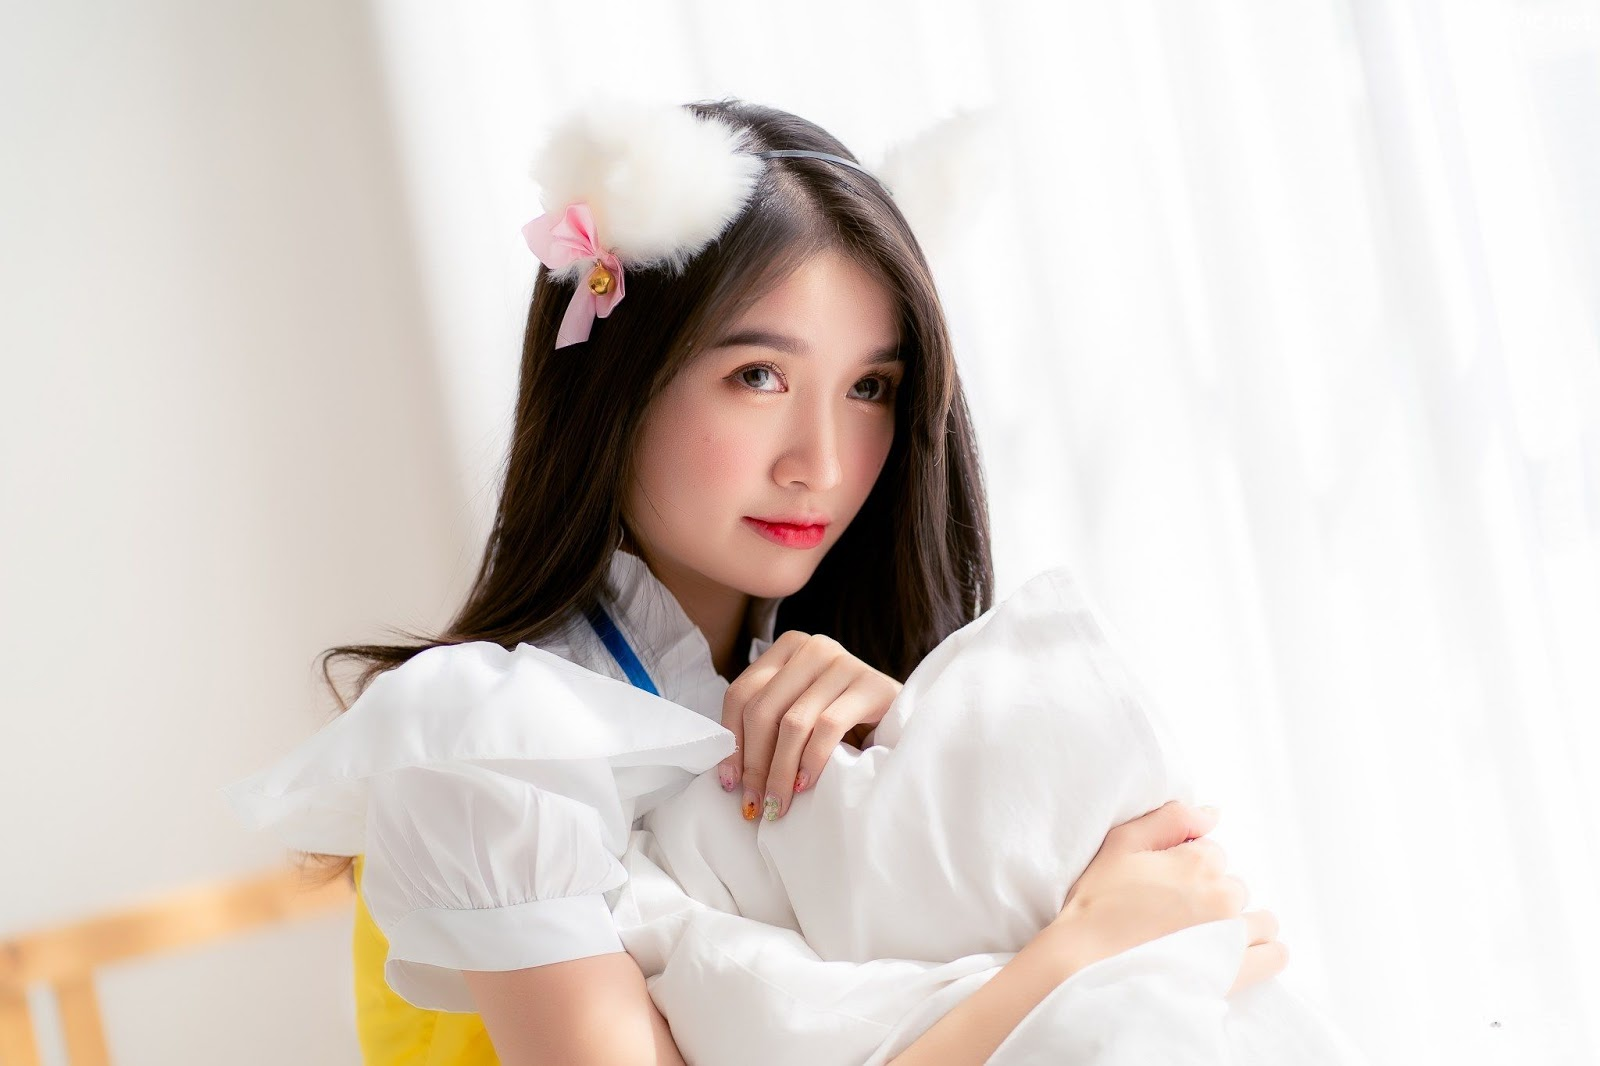 Image Thailand Model - Yatawee Limsiripothong - Cute Maid - TruePic.net - Picture-10